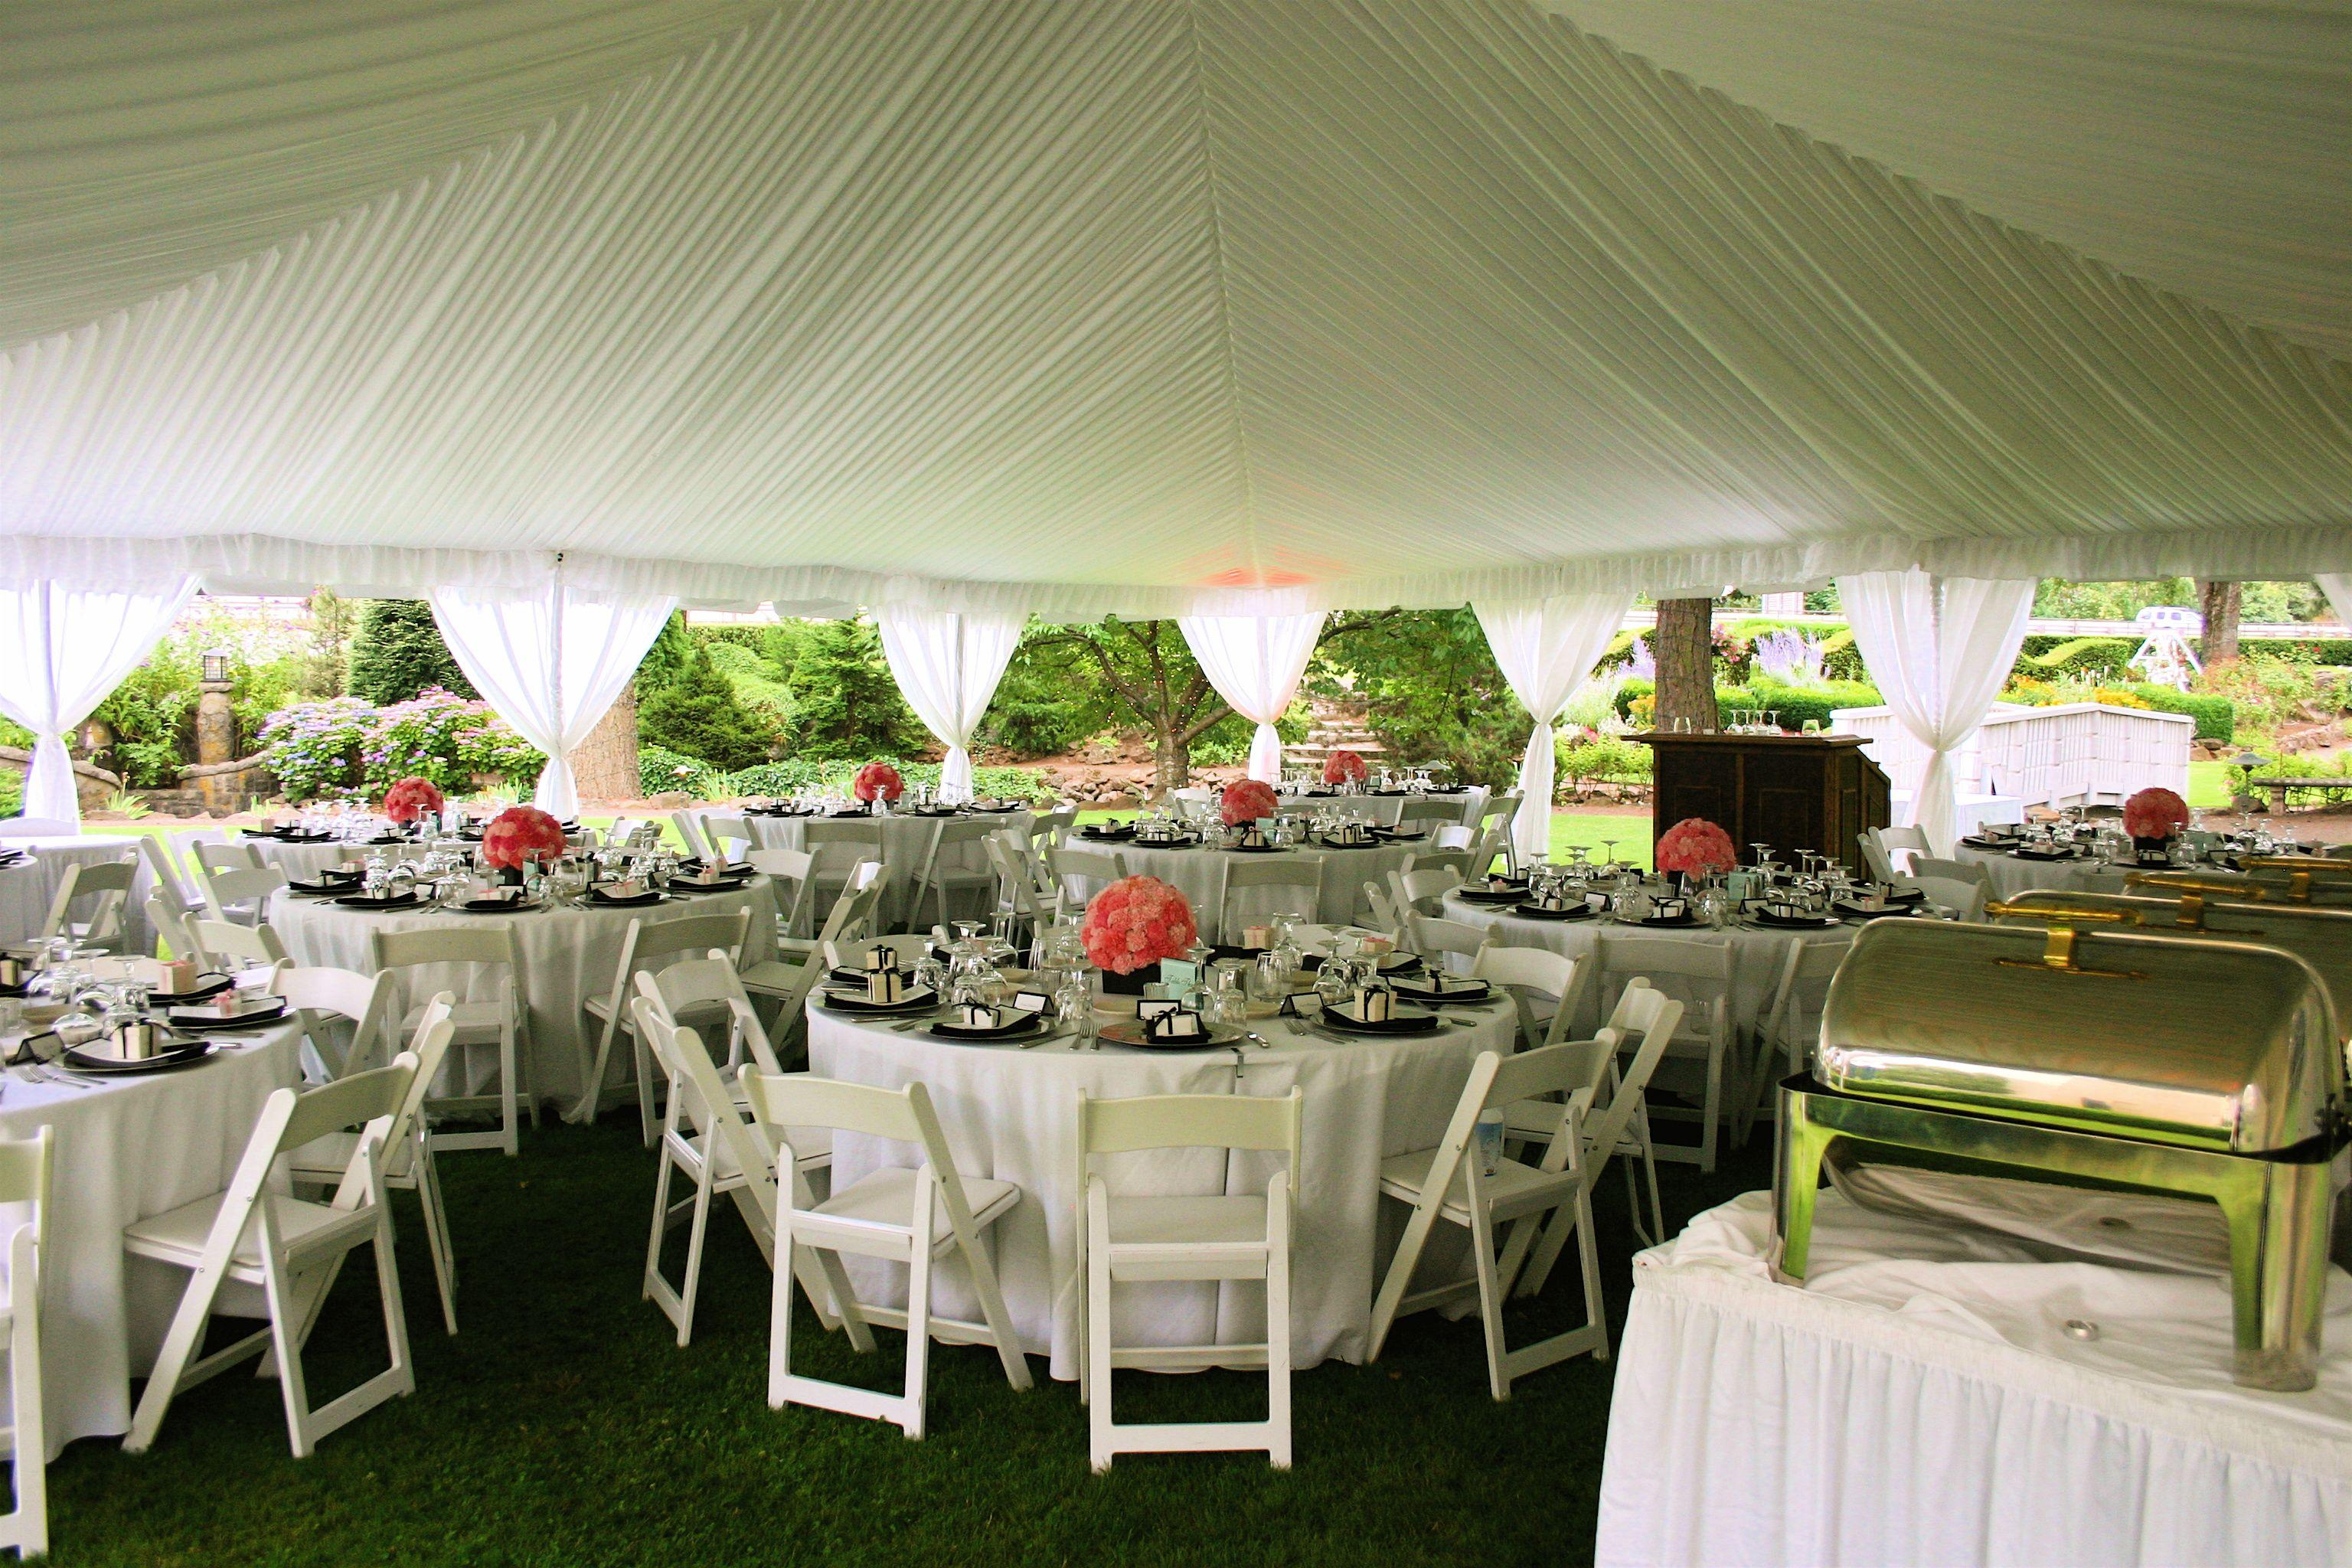 Classic White Tent Wedding Reception Wedding table